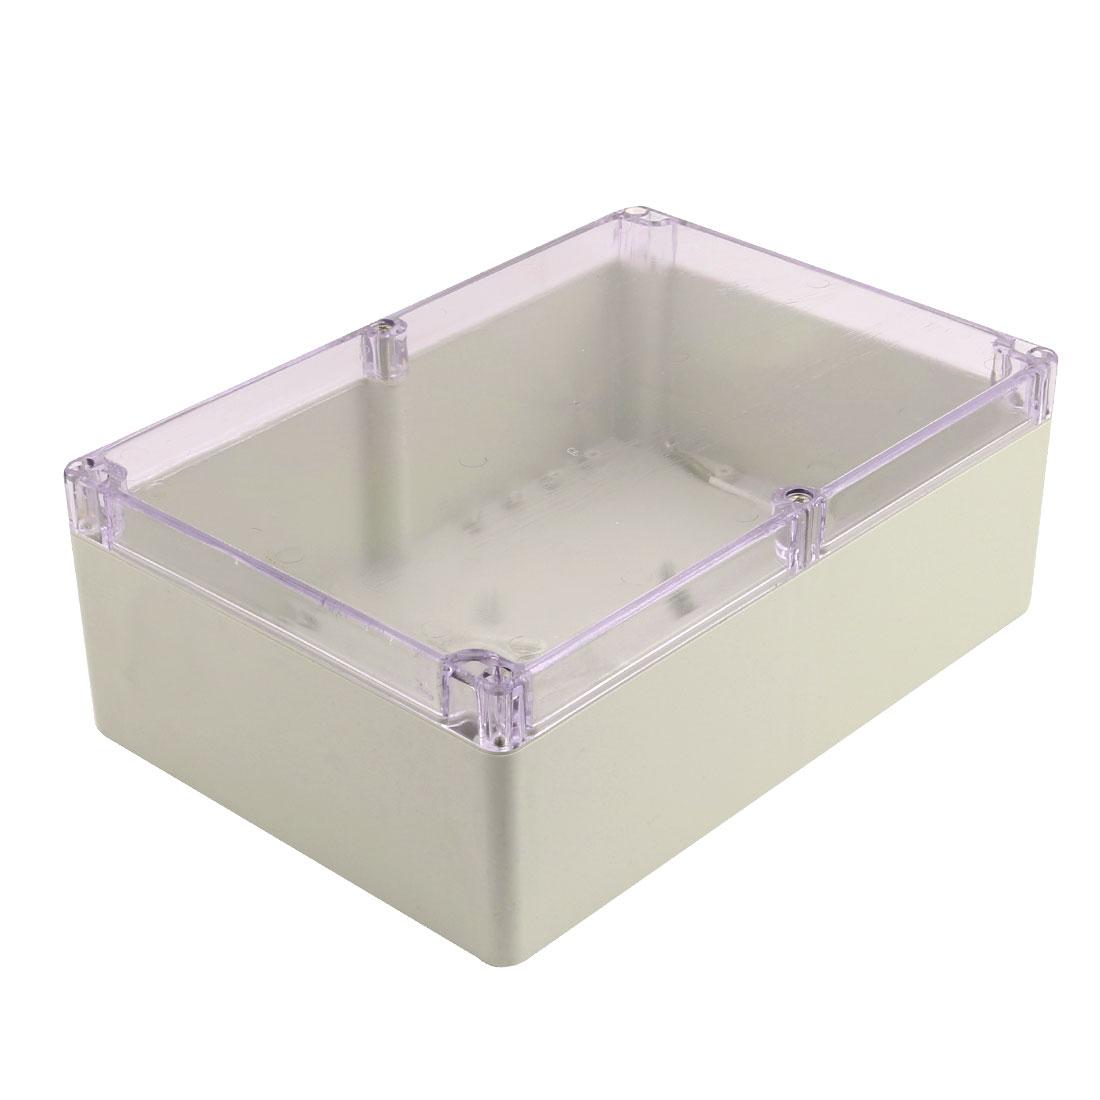 262mmx182mmx96mm Dustproof IP65 Plastic Enclosure DIY Junction Box Case